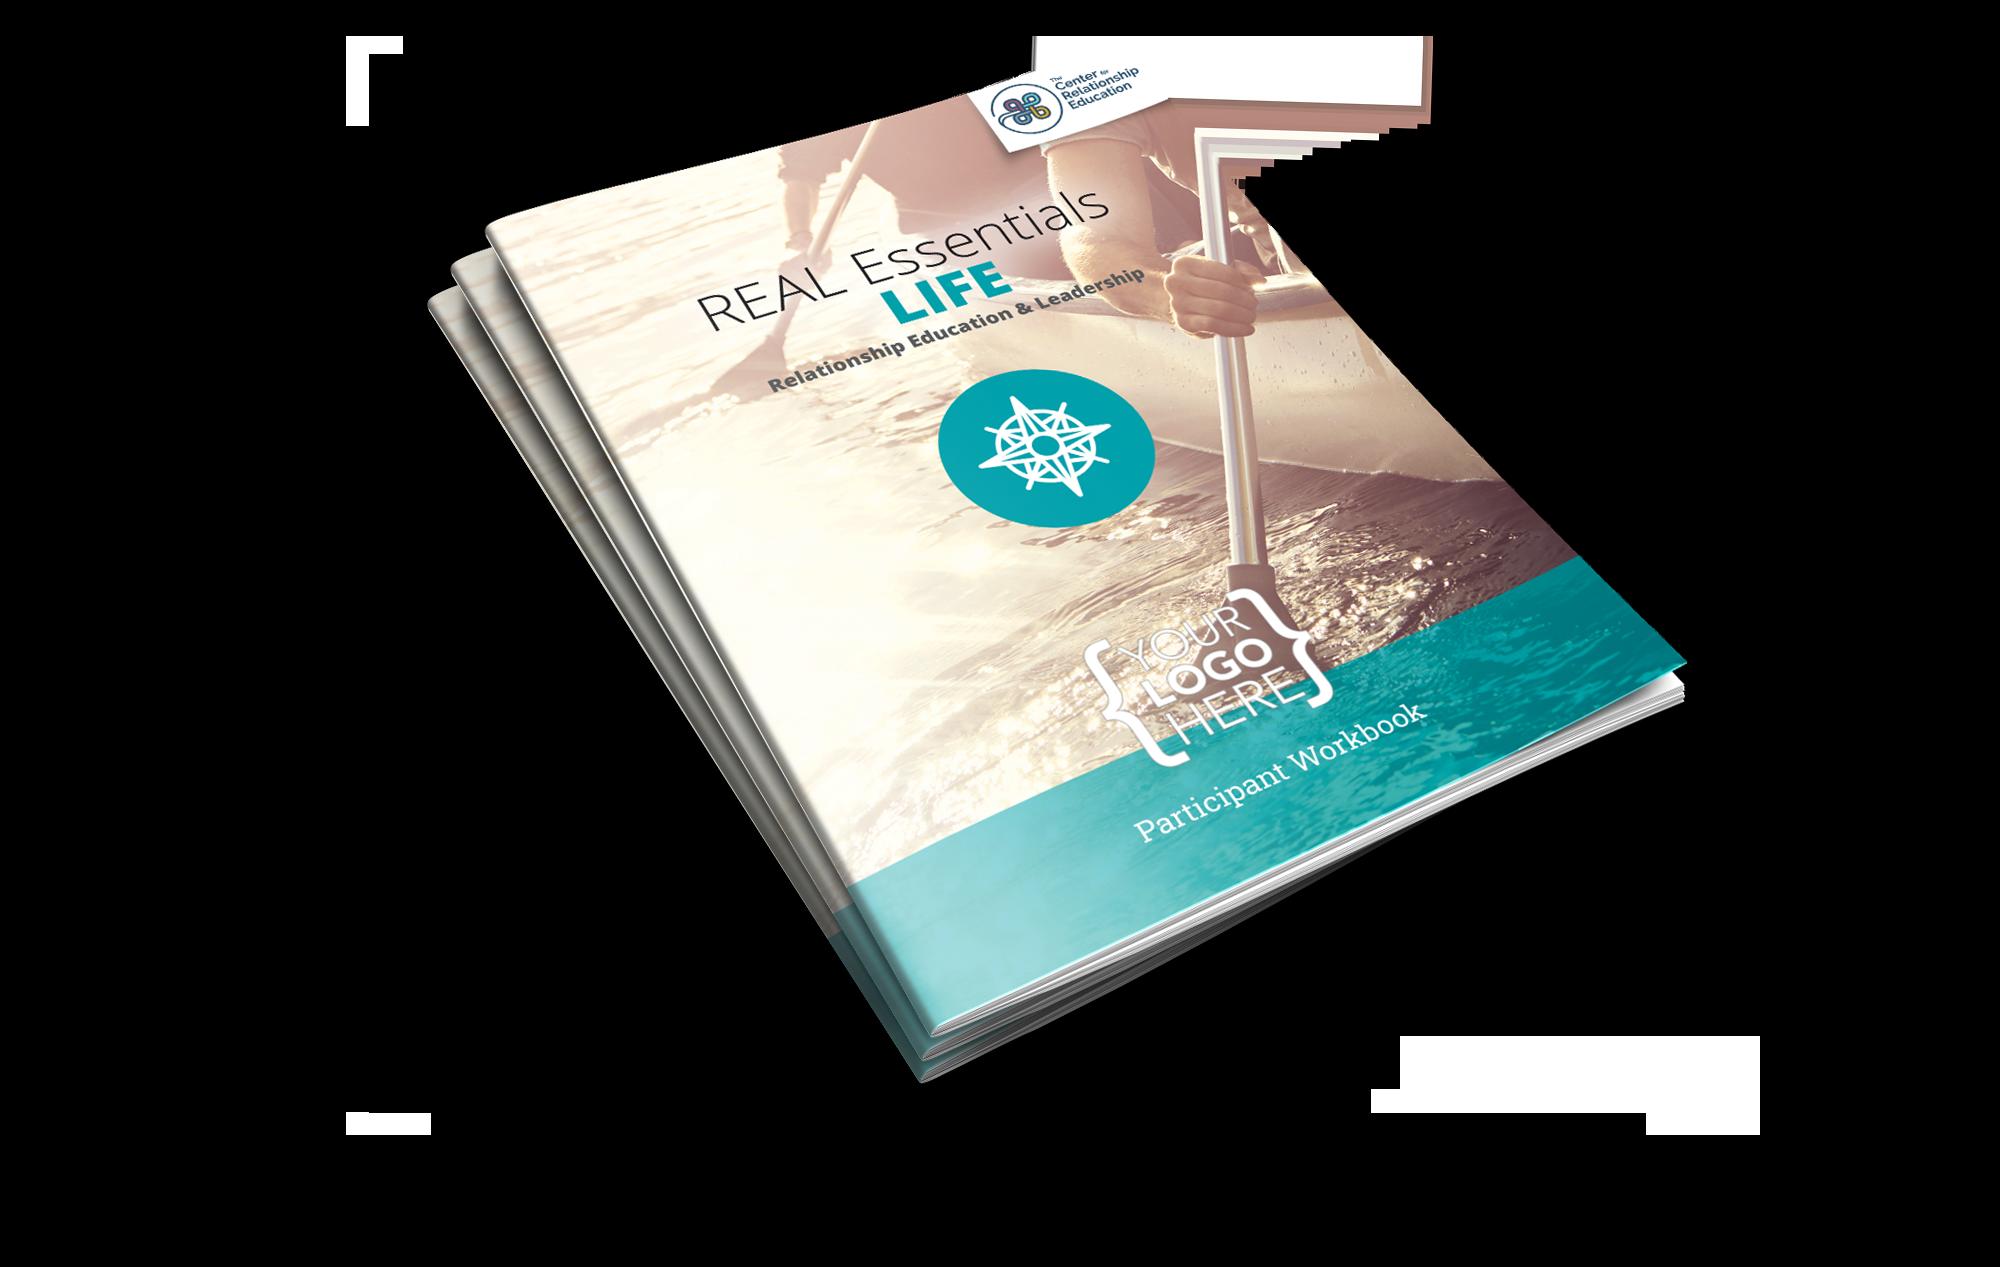 REAL Essentials Life Custom Workbook Licensing Agreement